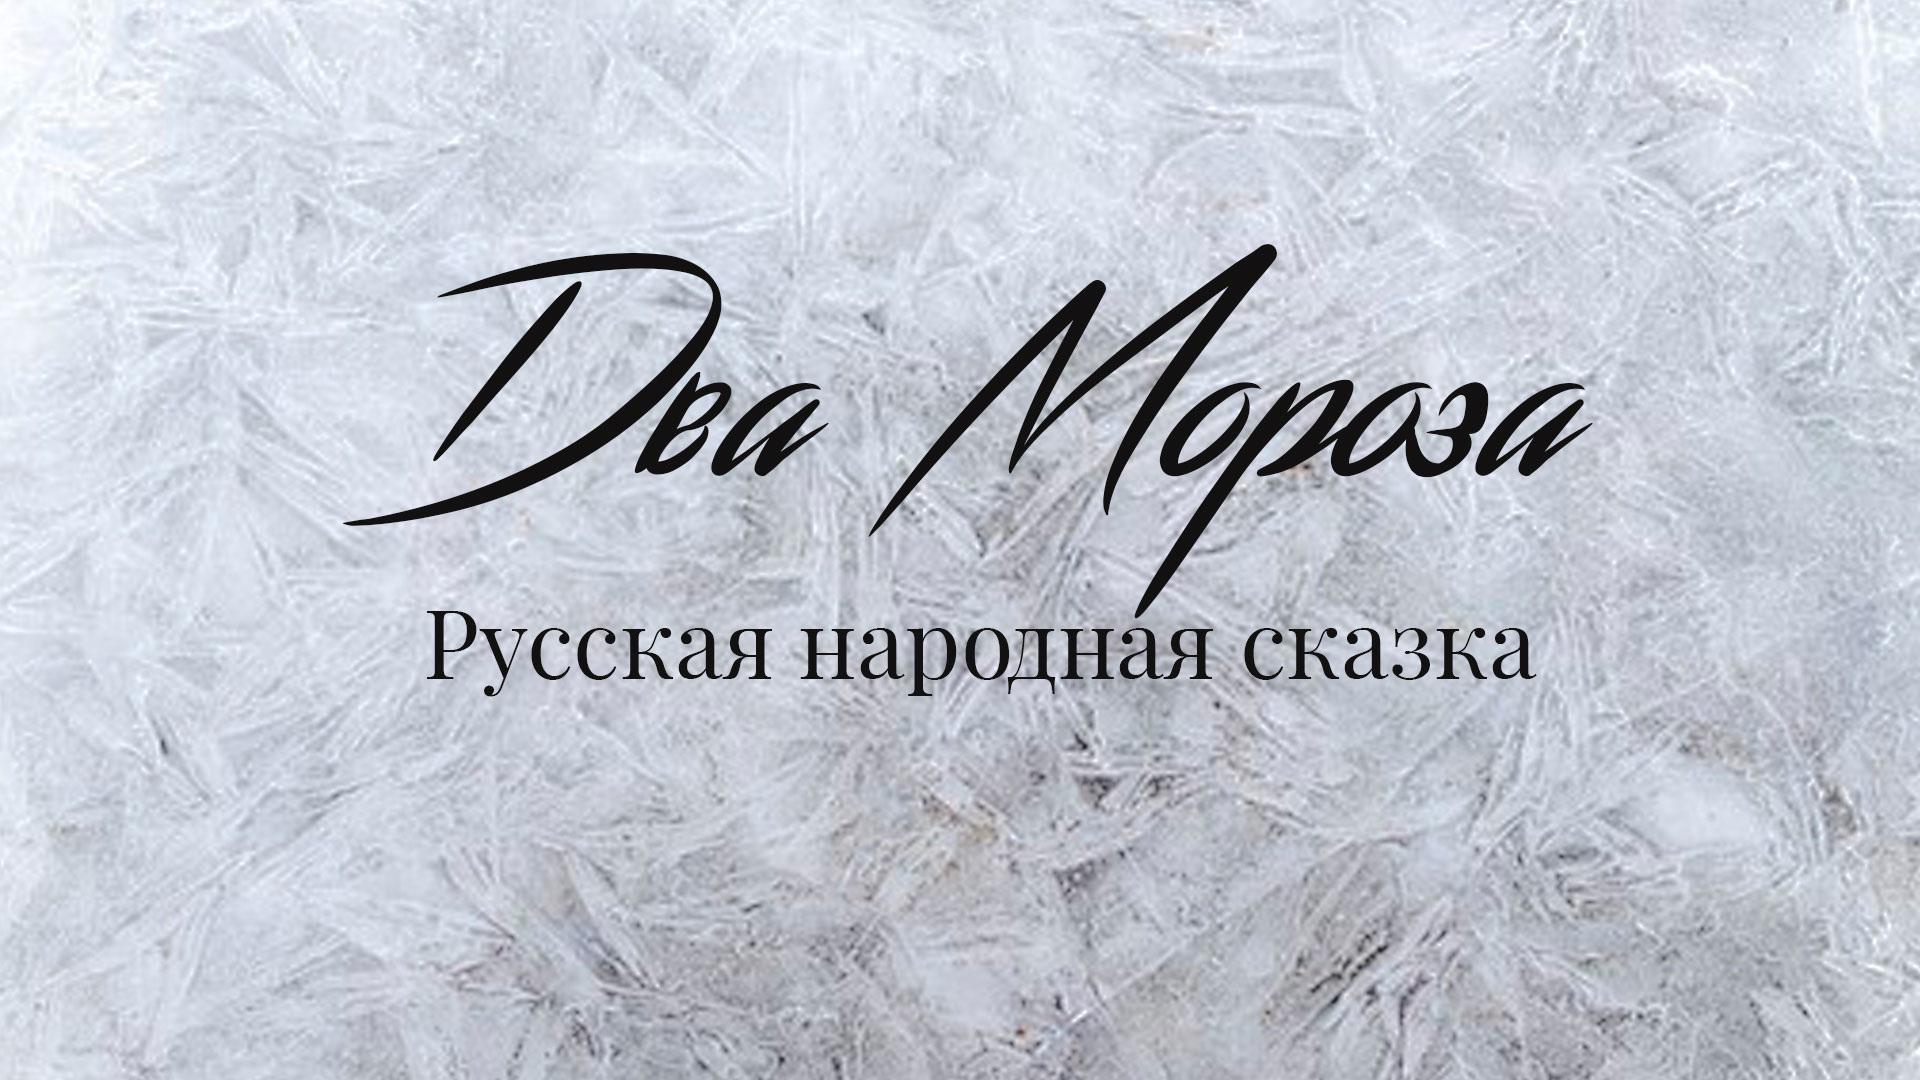 Два Мороза. Русская народная сказка